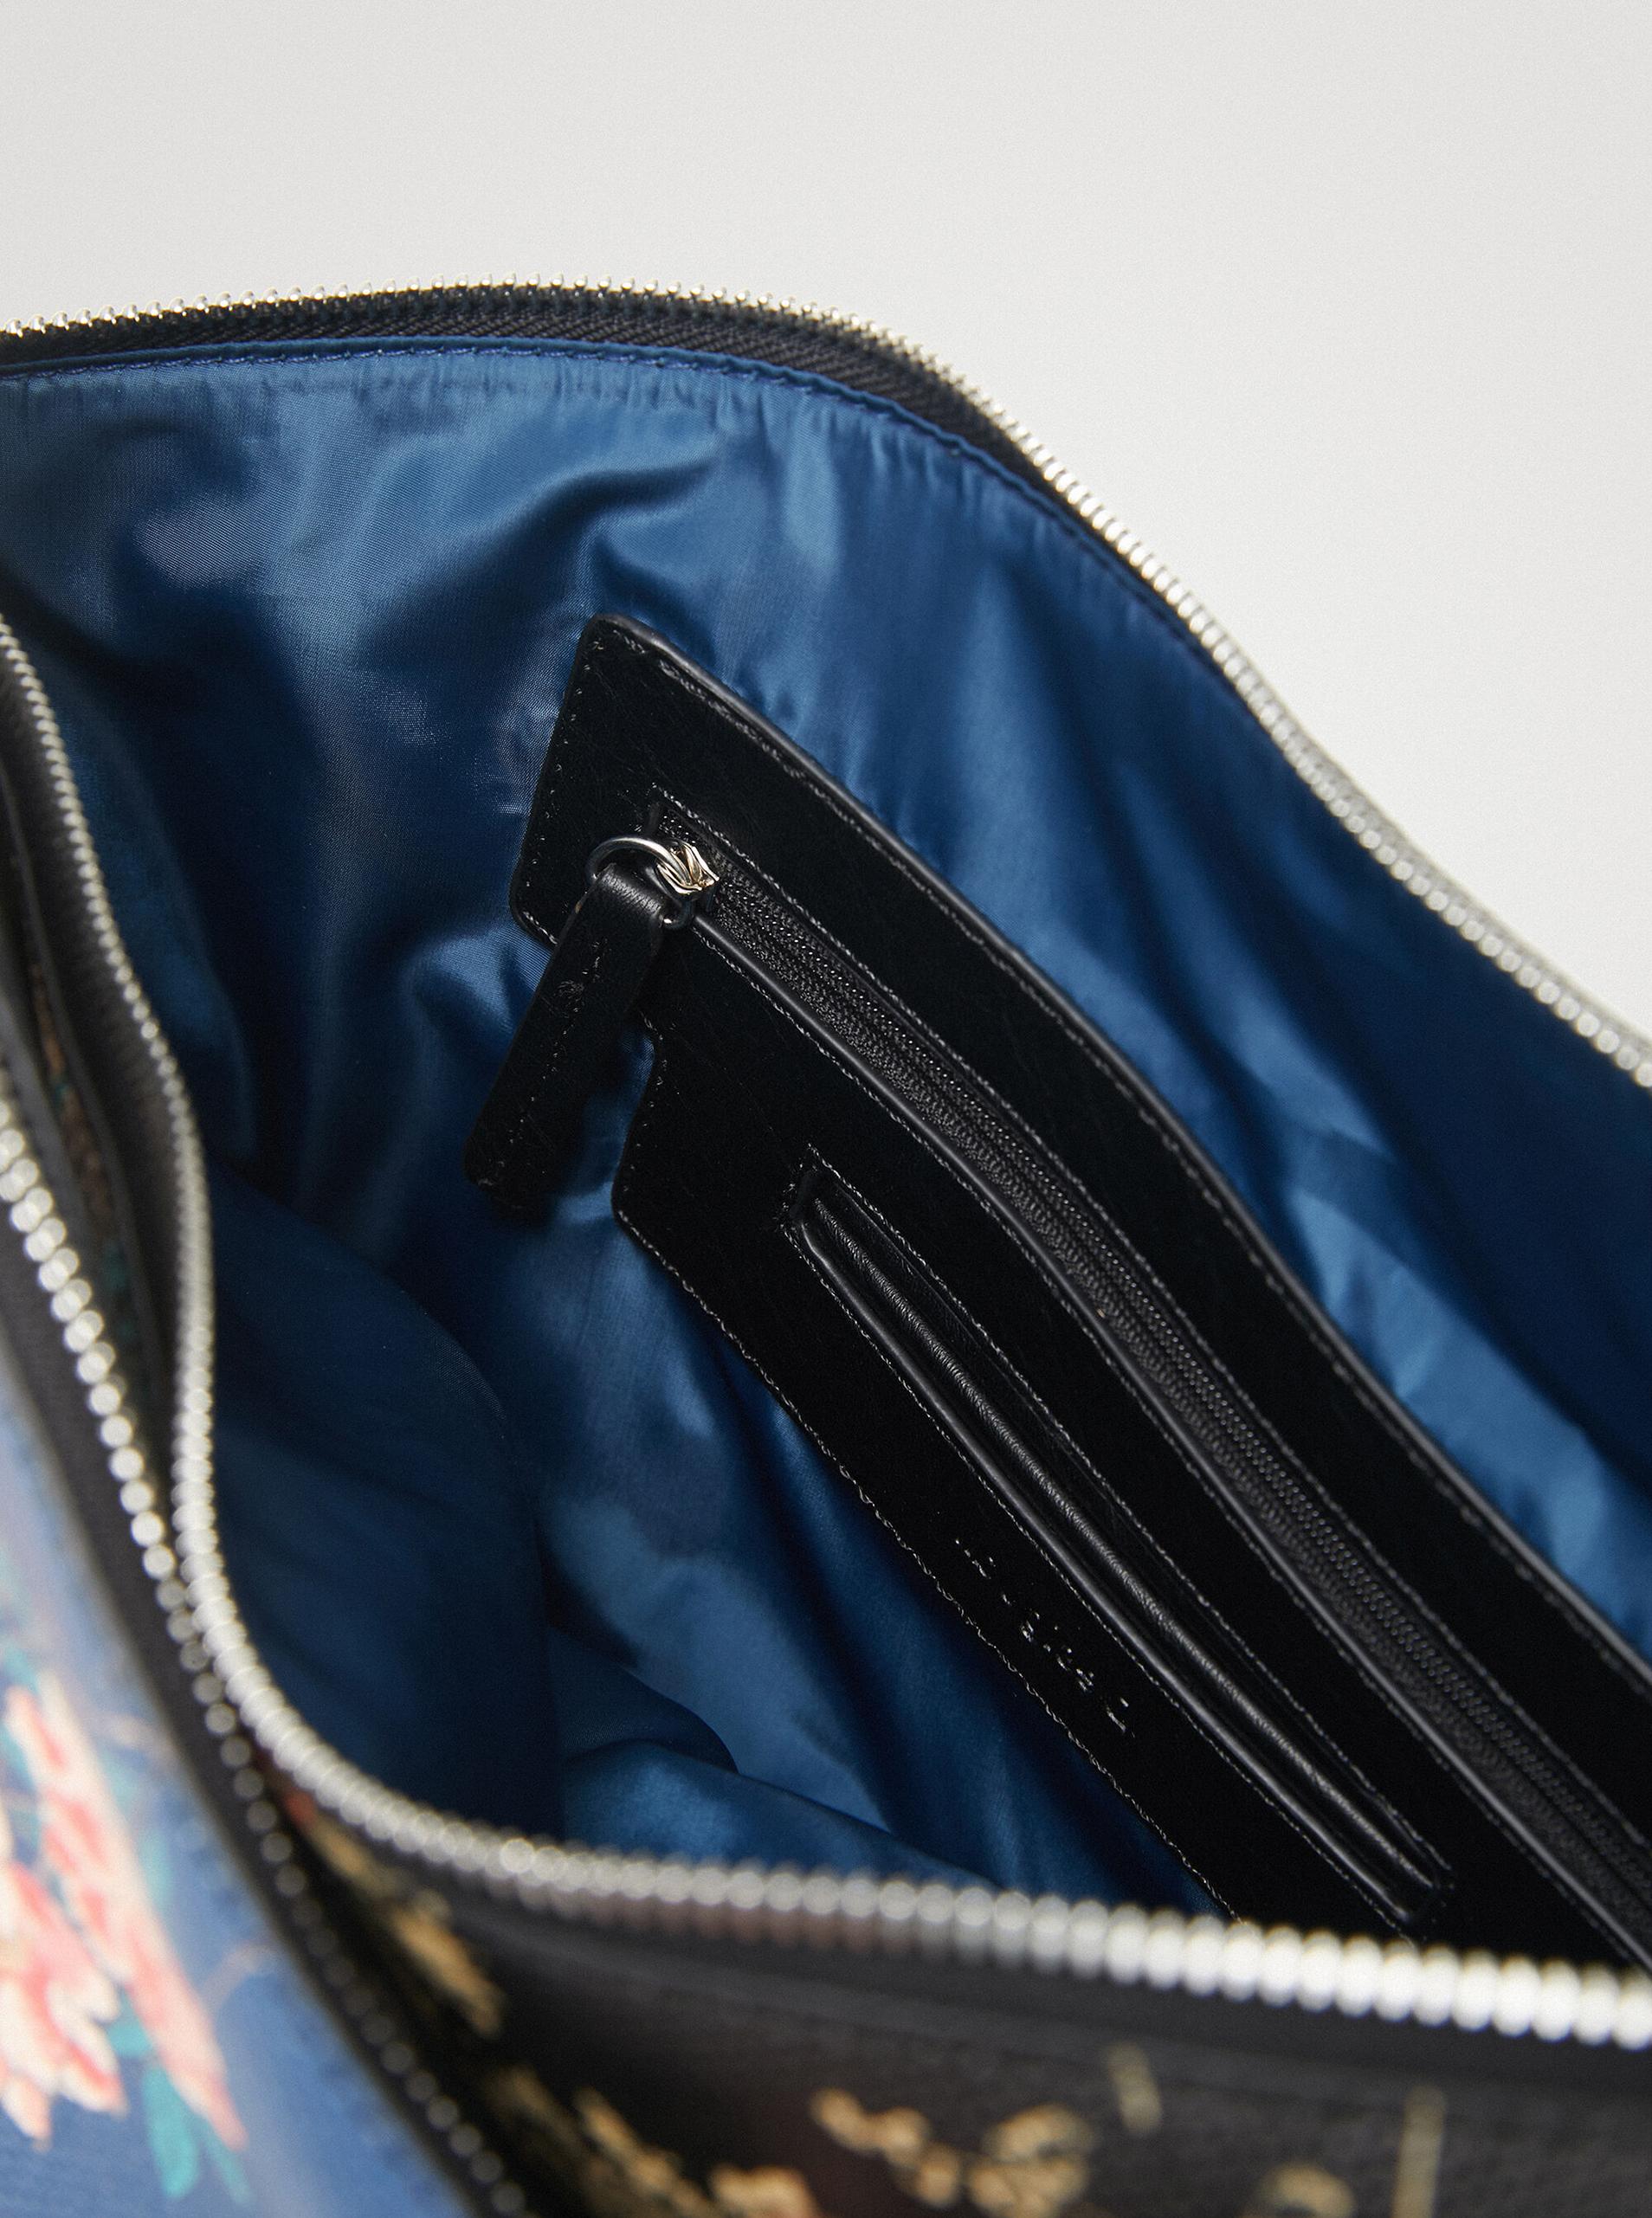 Desigual niebieski torebka Magnus Harry 2.0 Maxi